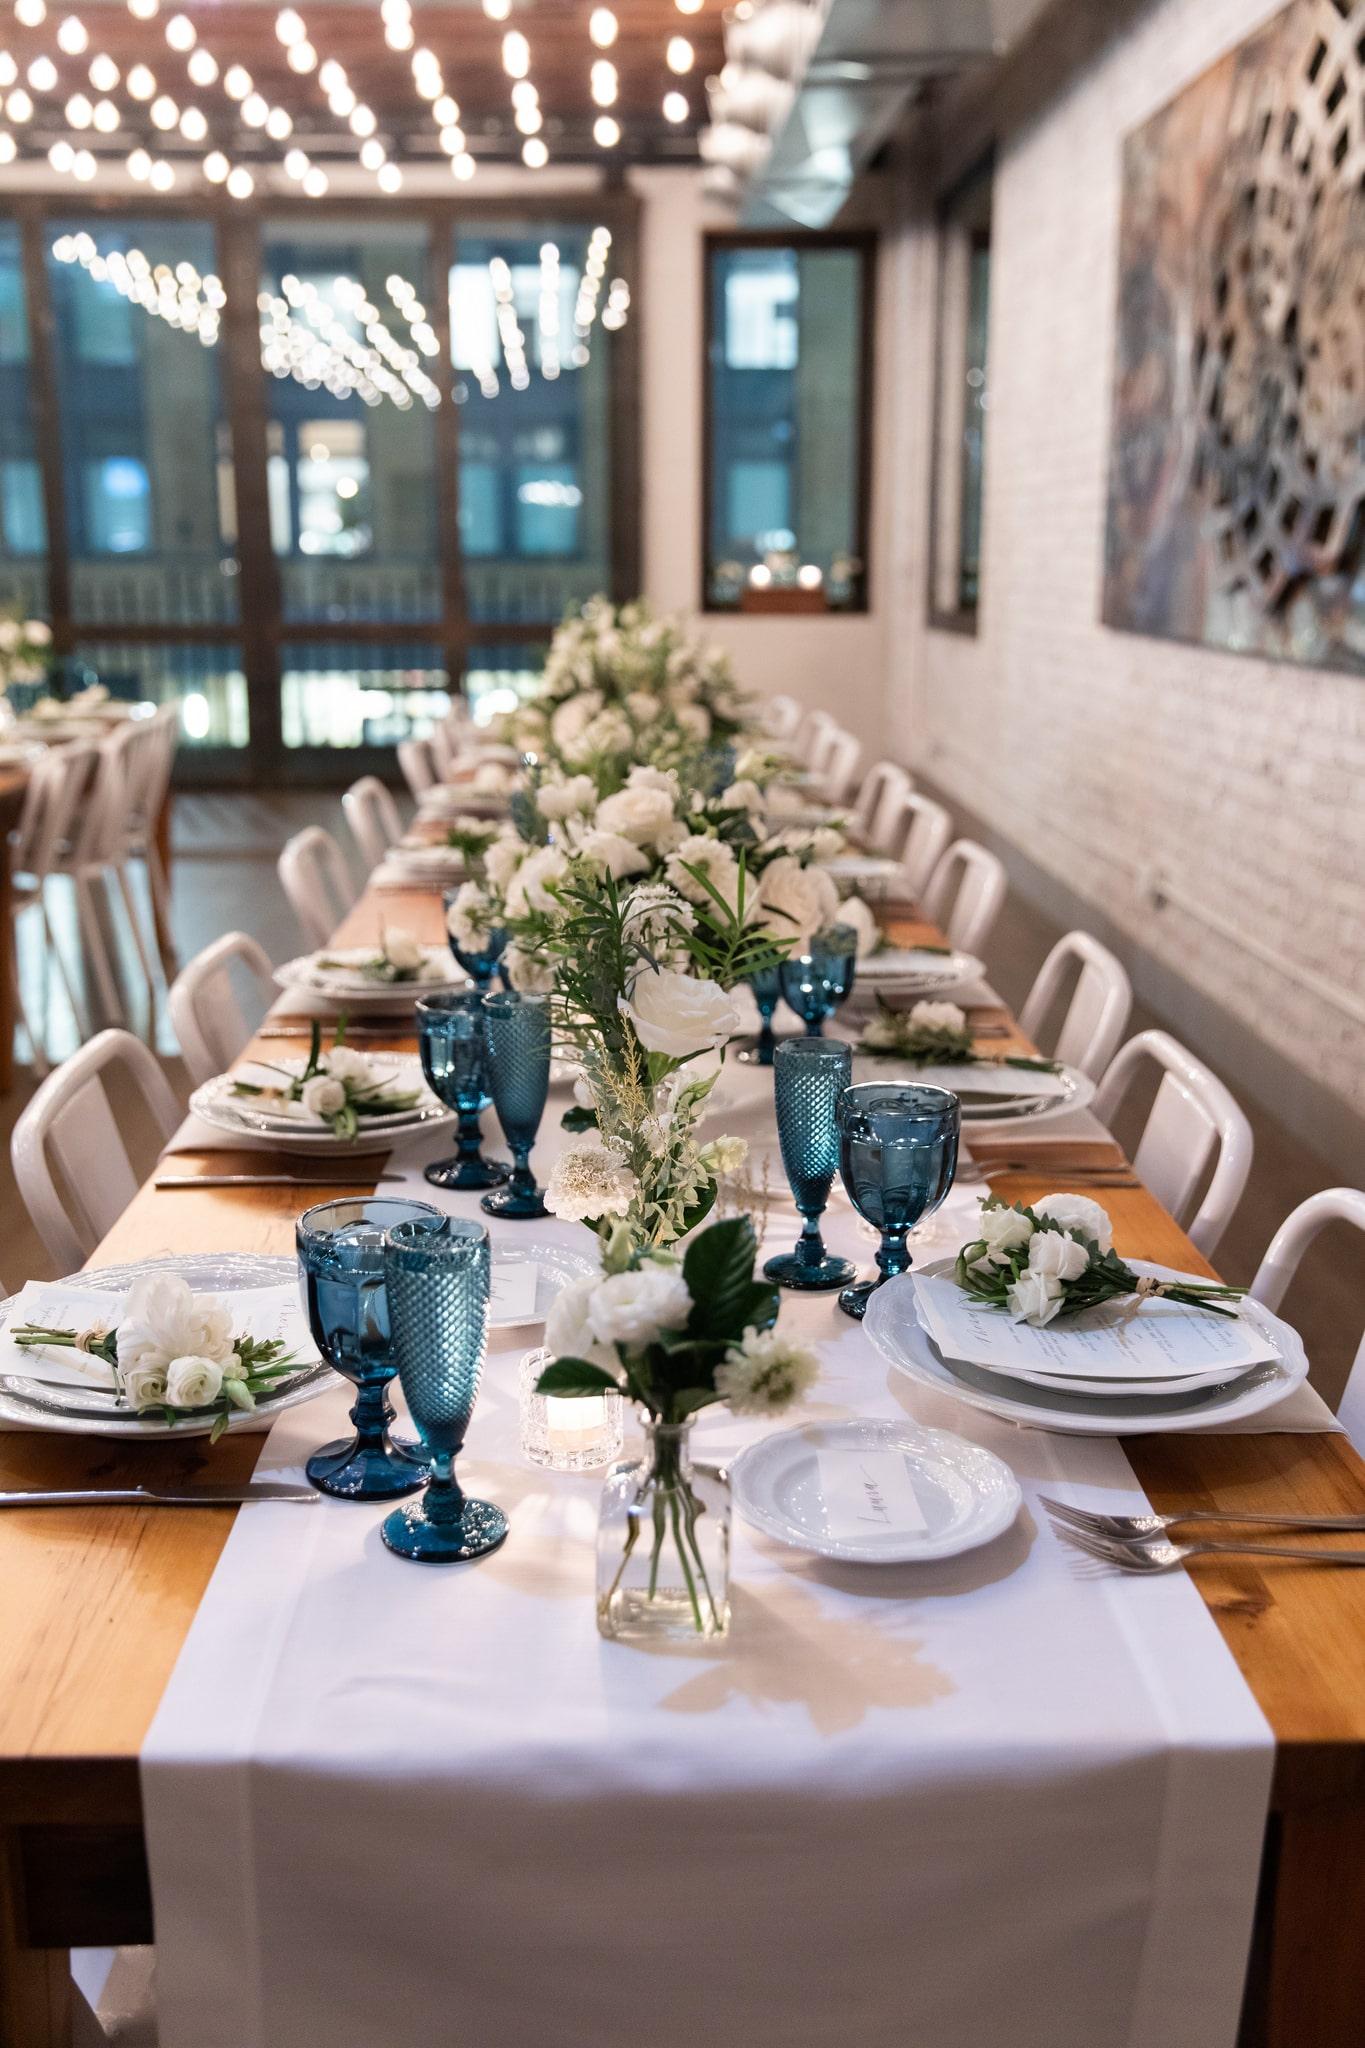 Clean and Simplistic Tablescape- B Floral